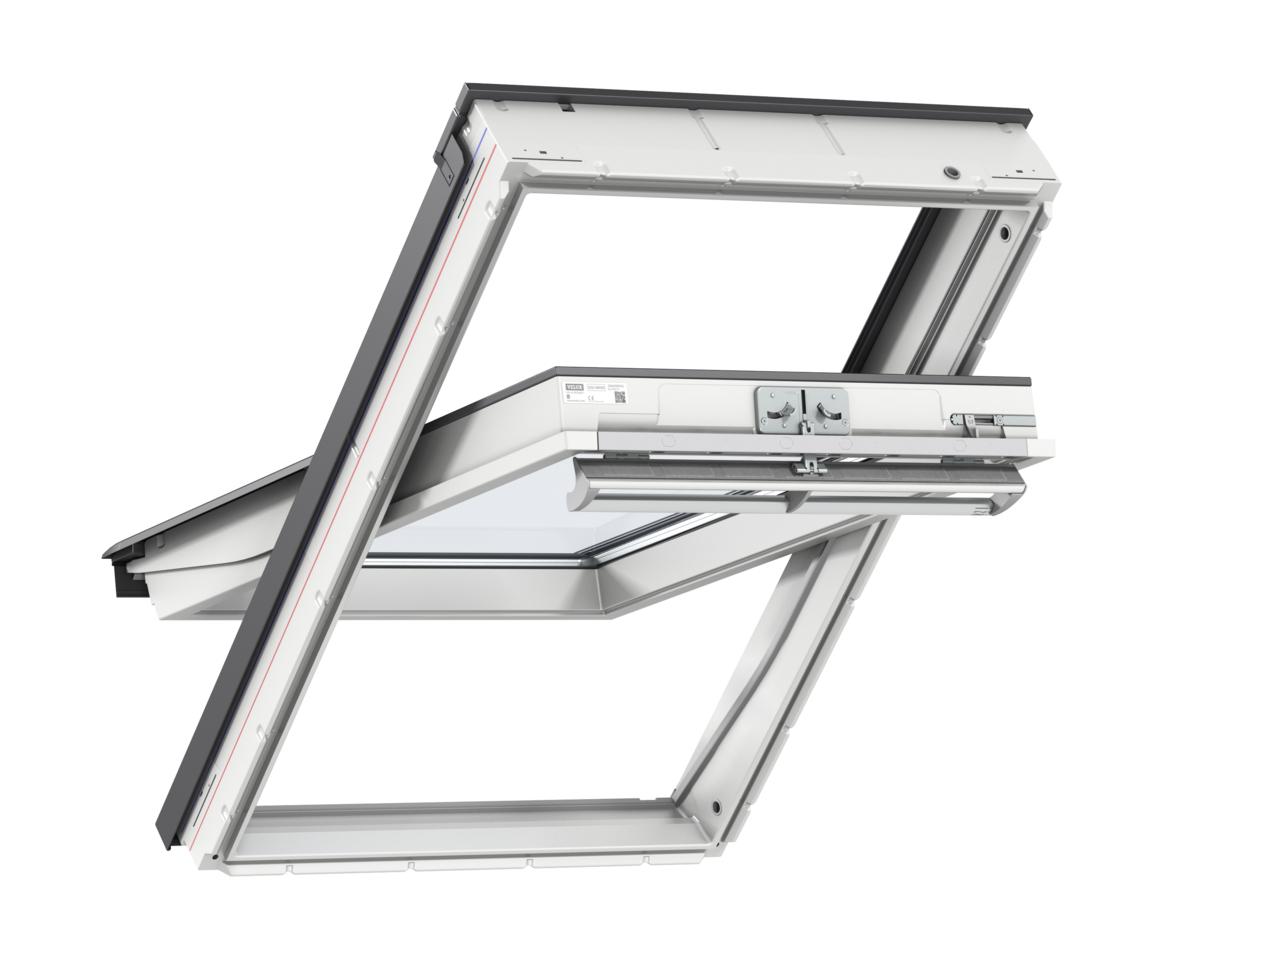 Velux GGU MK06 780 x 1180mm Centre Pivot 34Pane Roof Window - White Polyurethane